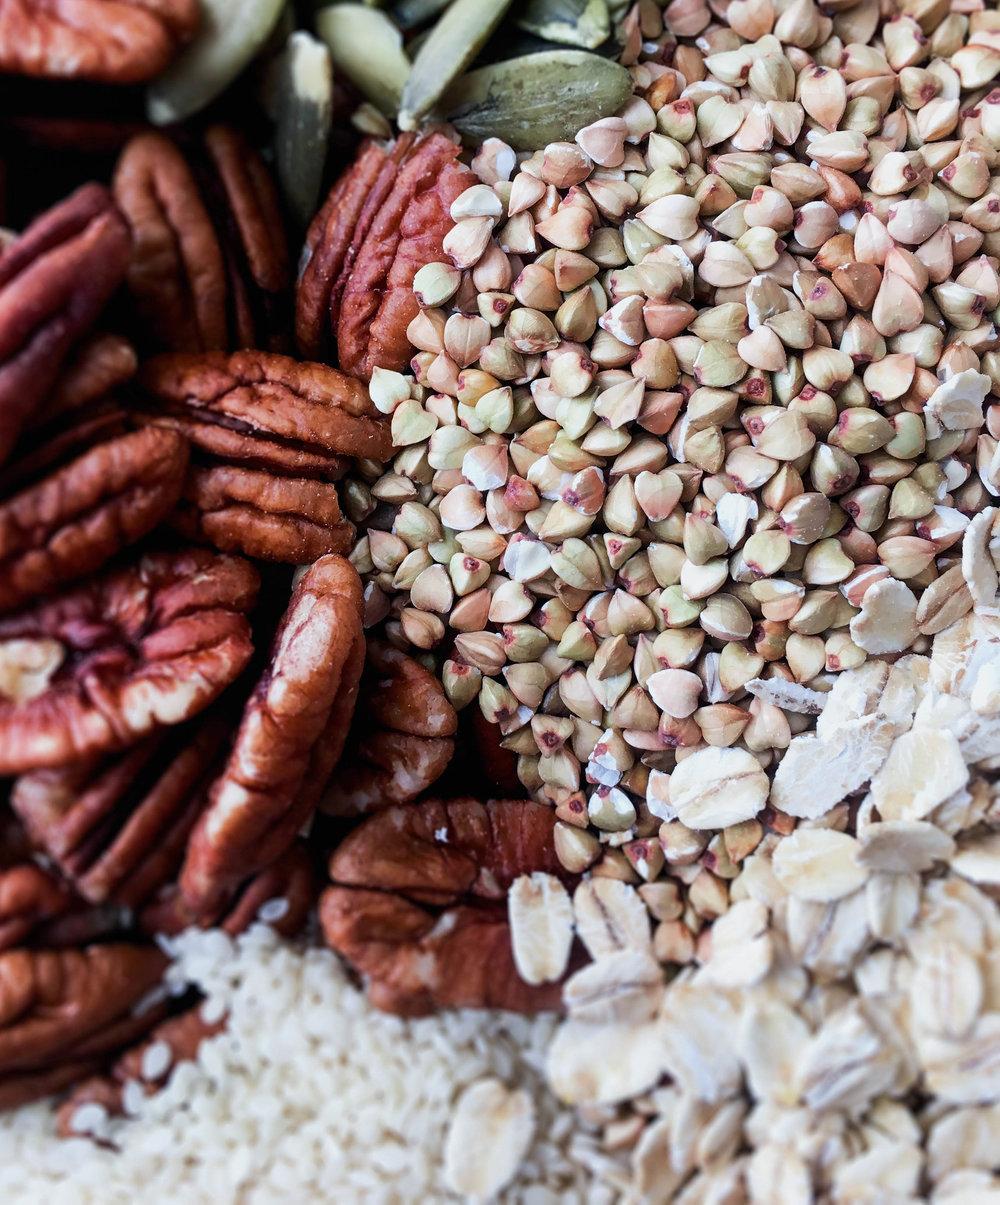 vegan gluten free granola ingredients, food photography, buckwheat